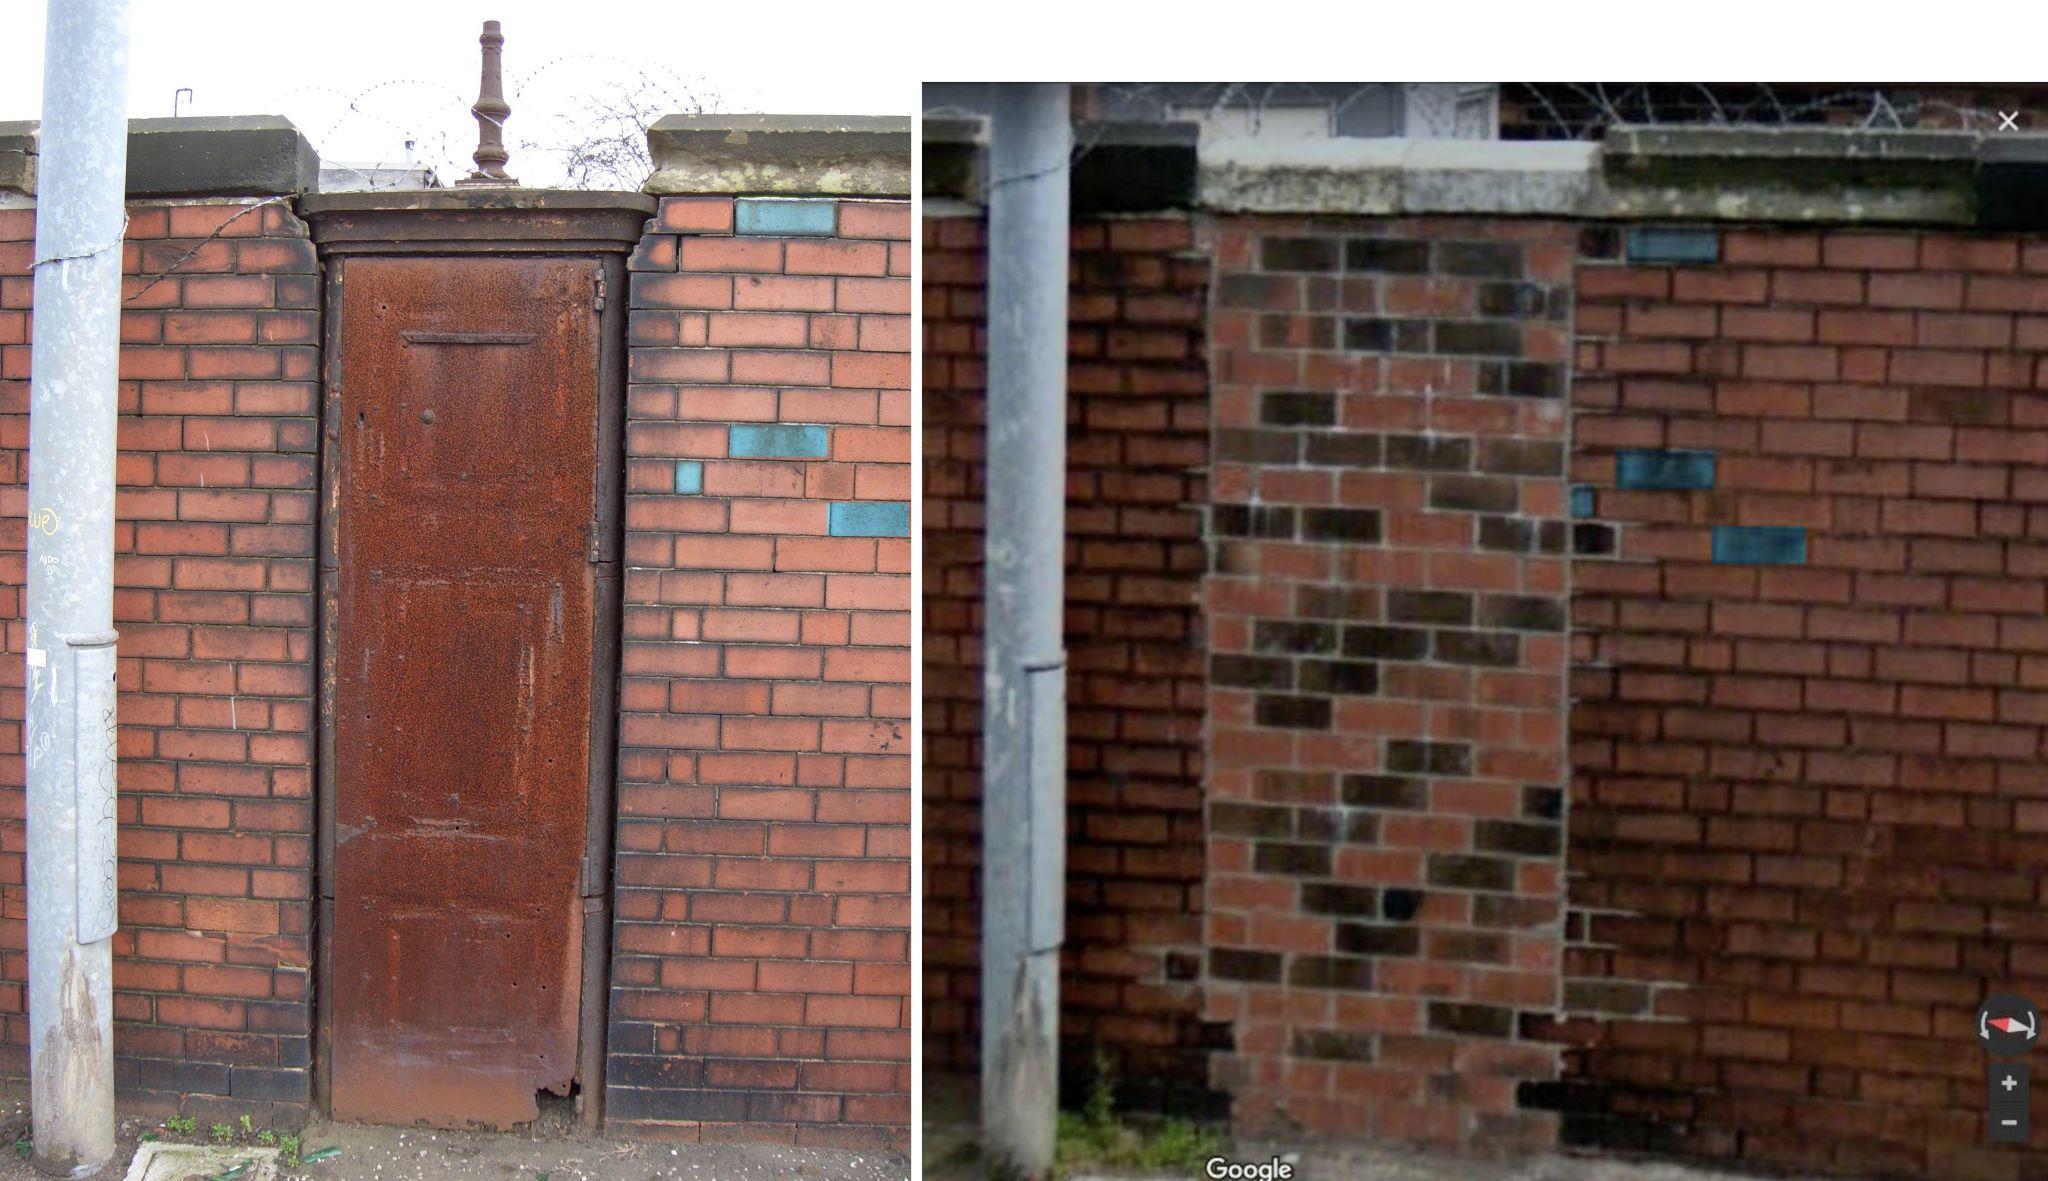 00 Brick Height Comparison.jpg